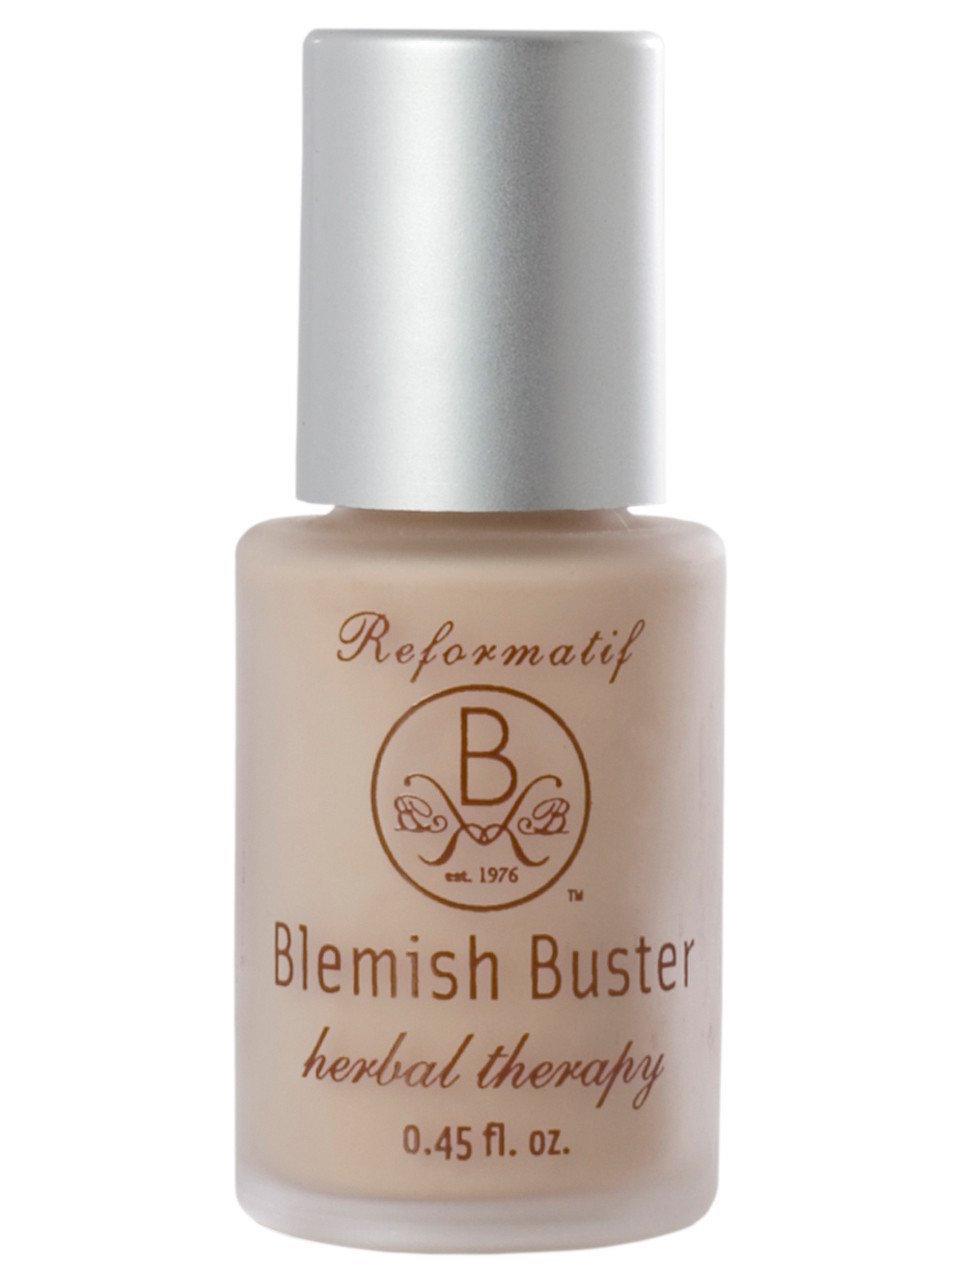 Blemish Buster